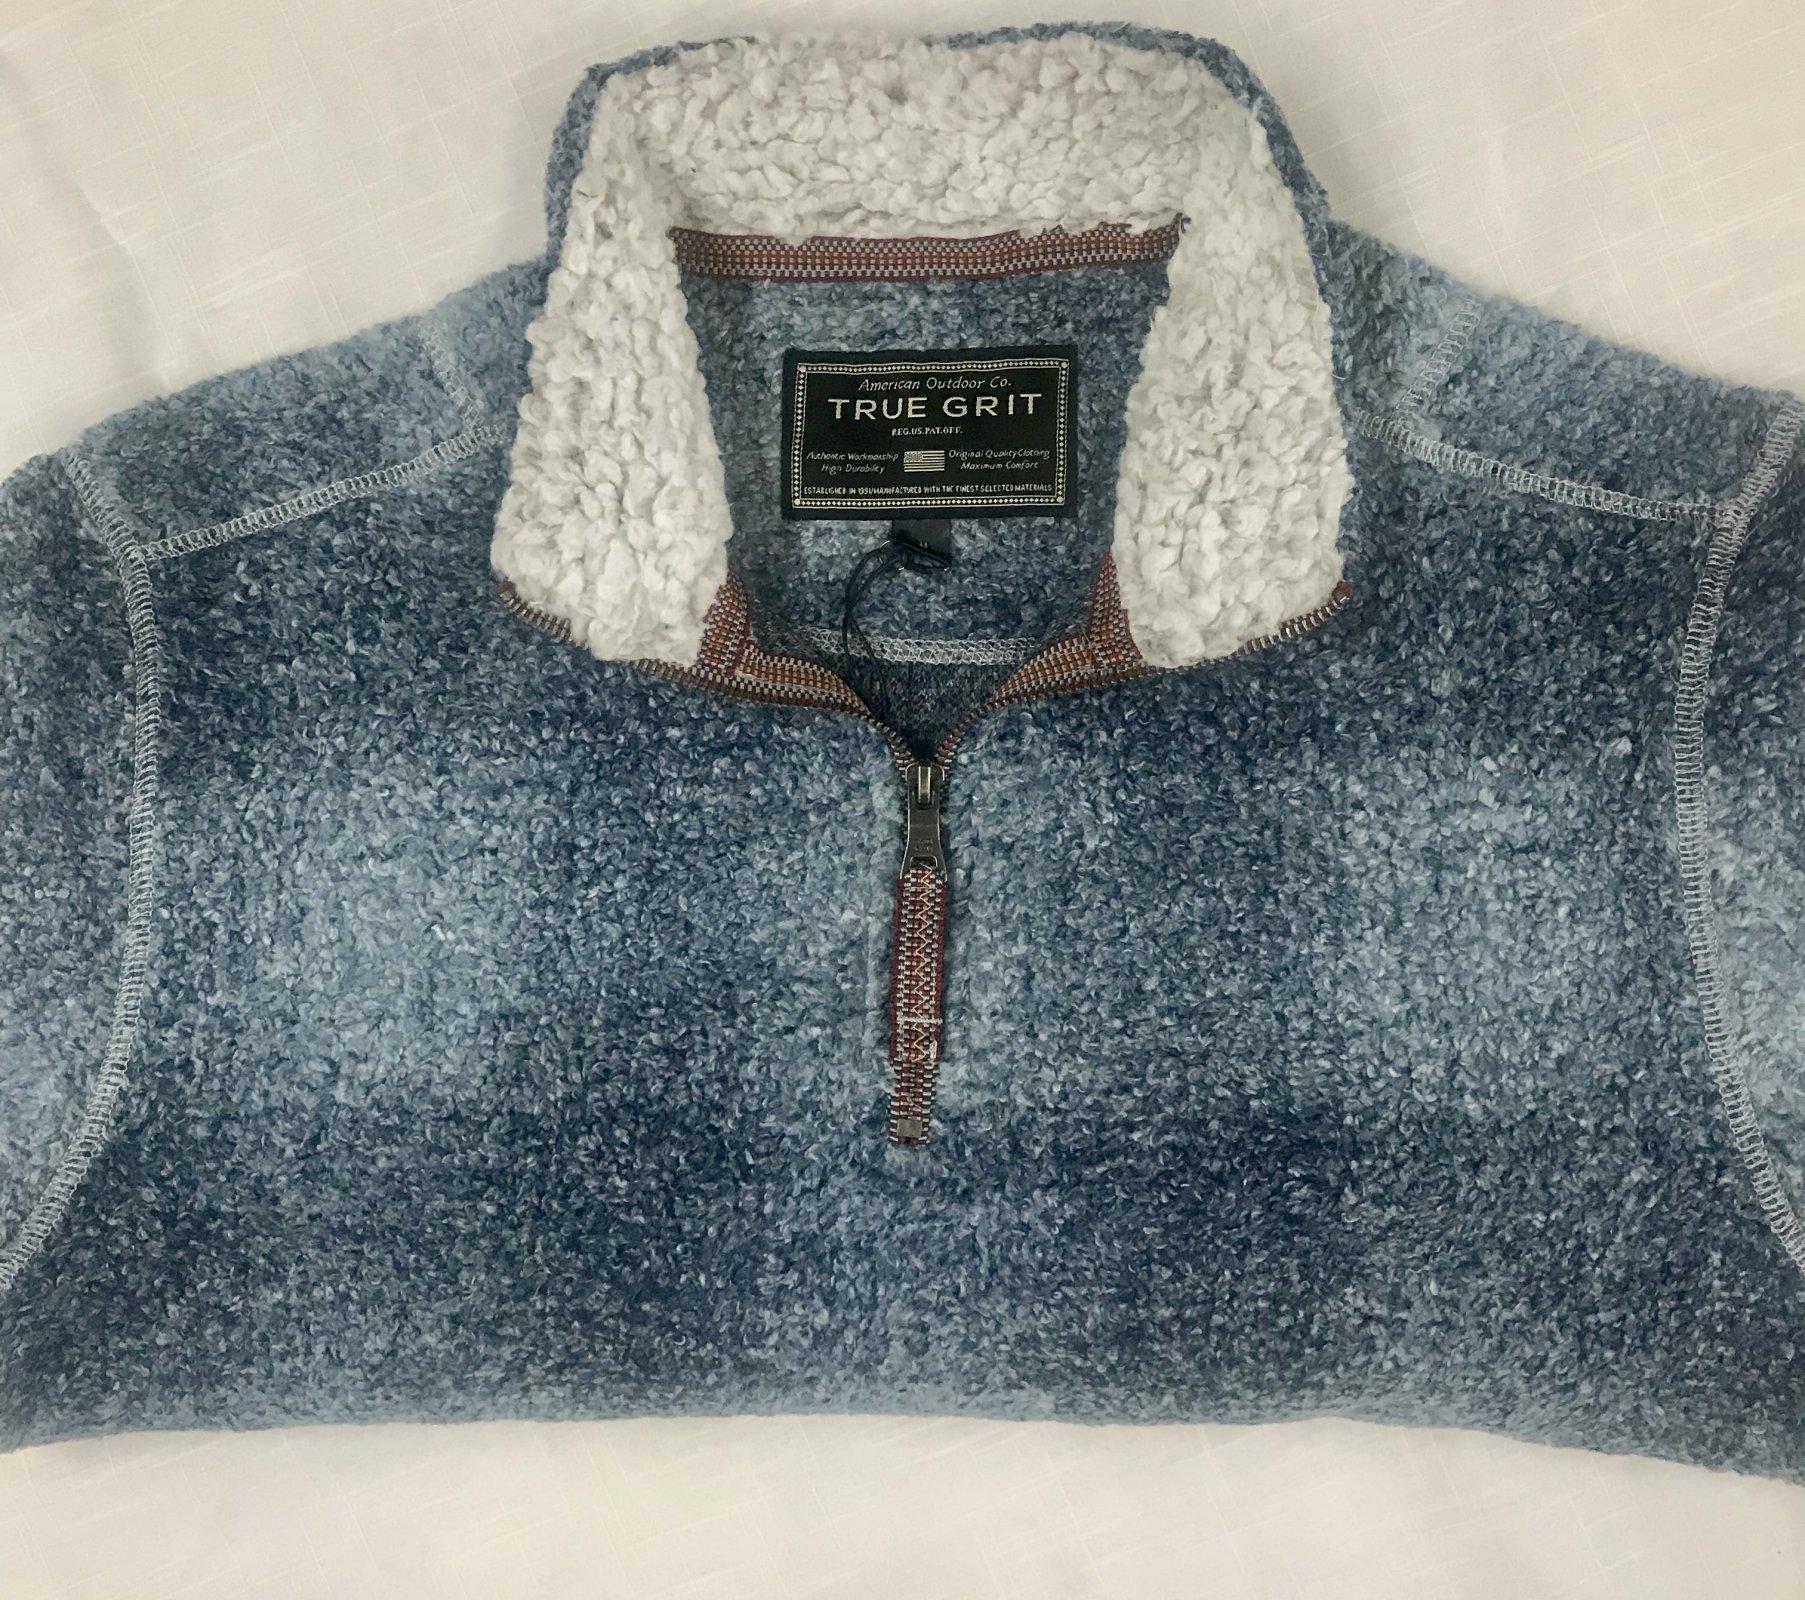 True Grit Melange Shadow Plaid 1/4 Zip Pullover